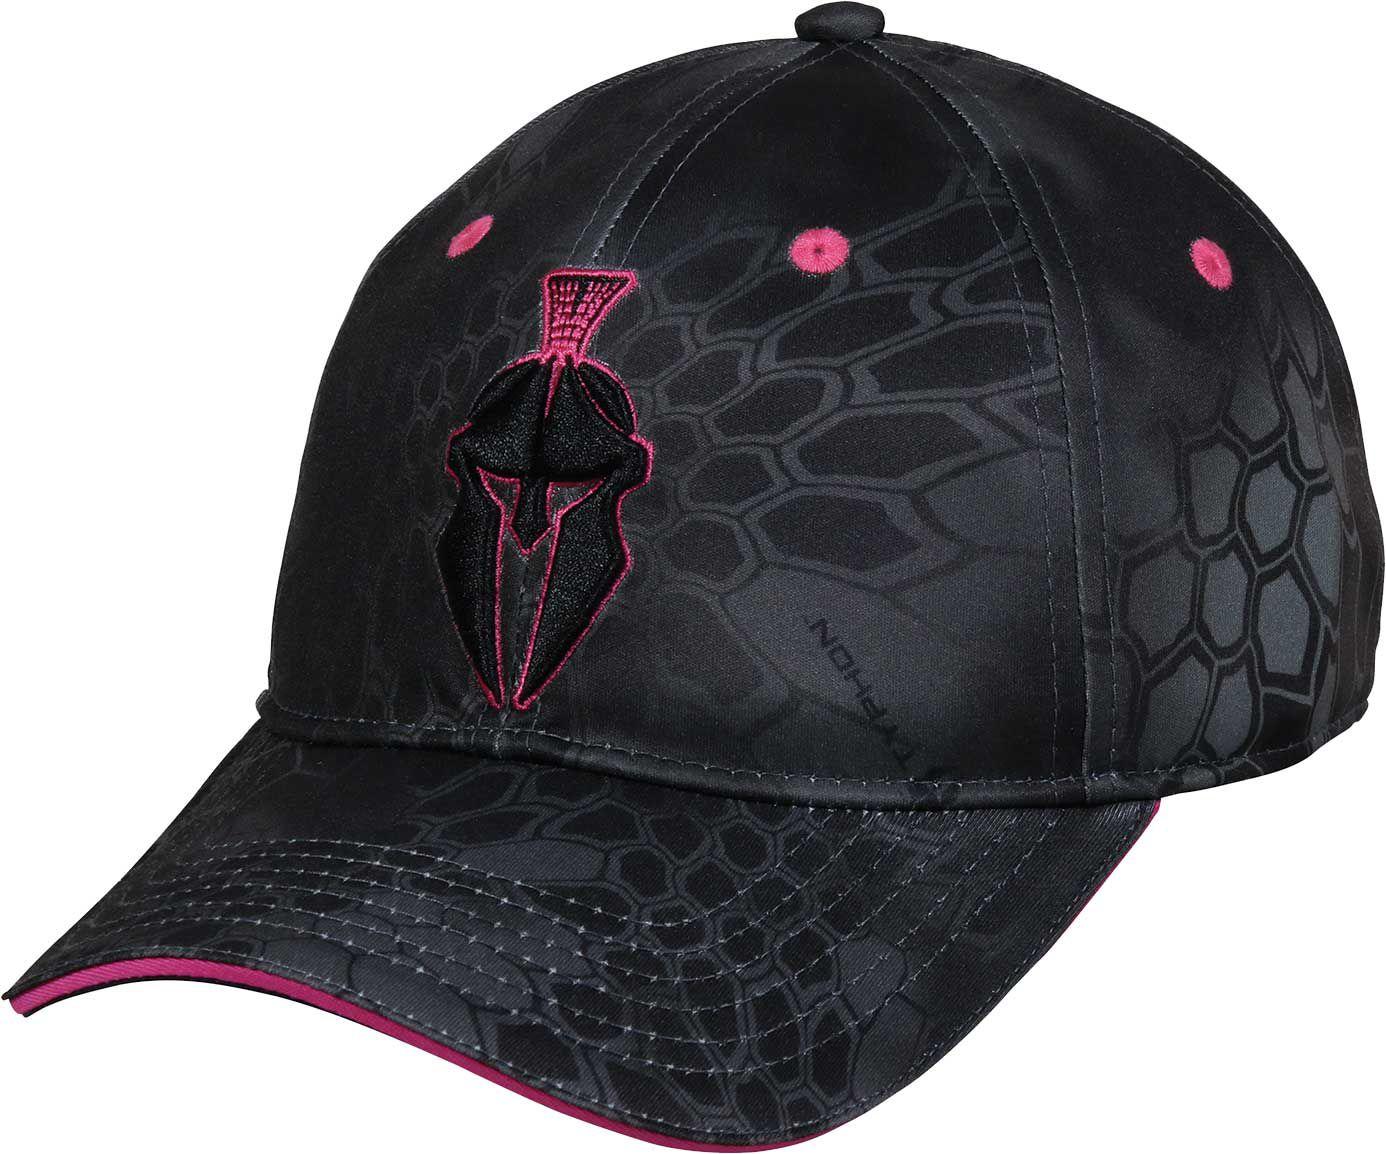 Outdoor Cap Women's Kryptek Typhon Spartan Hat, Multi